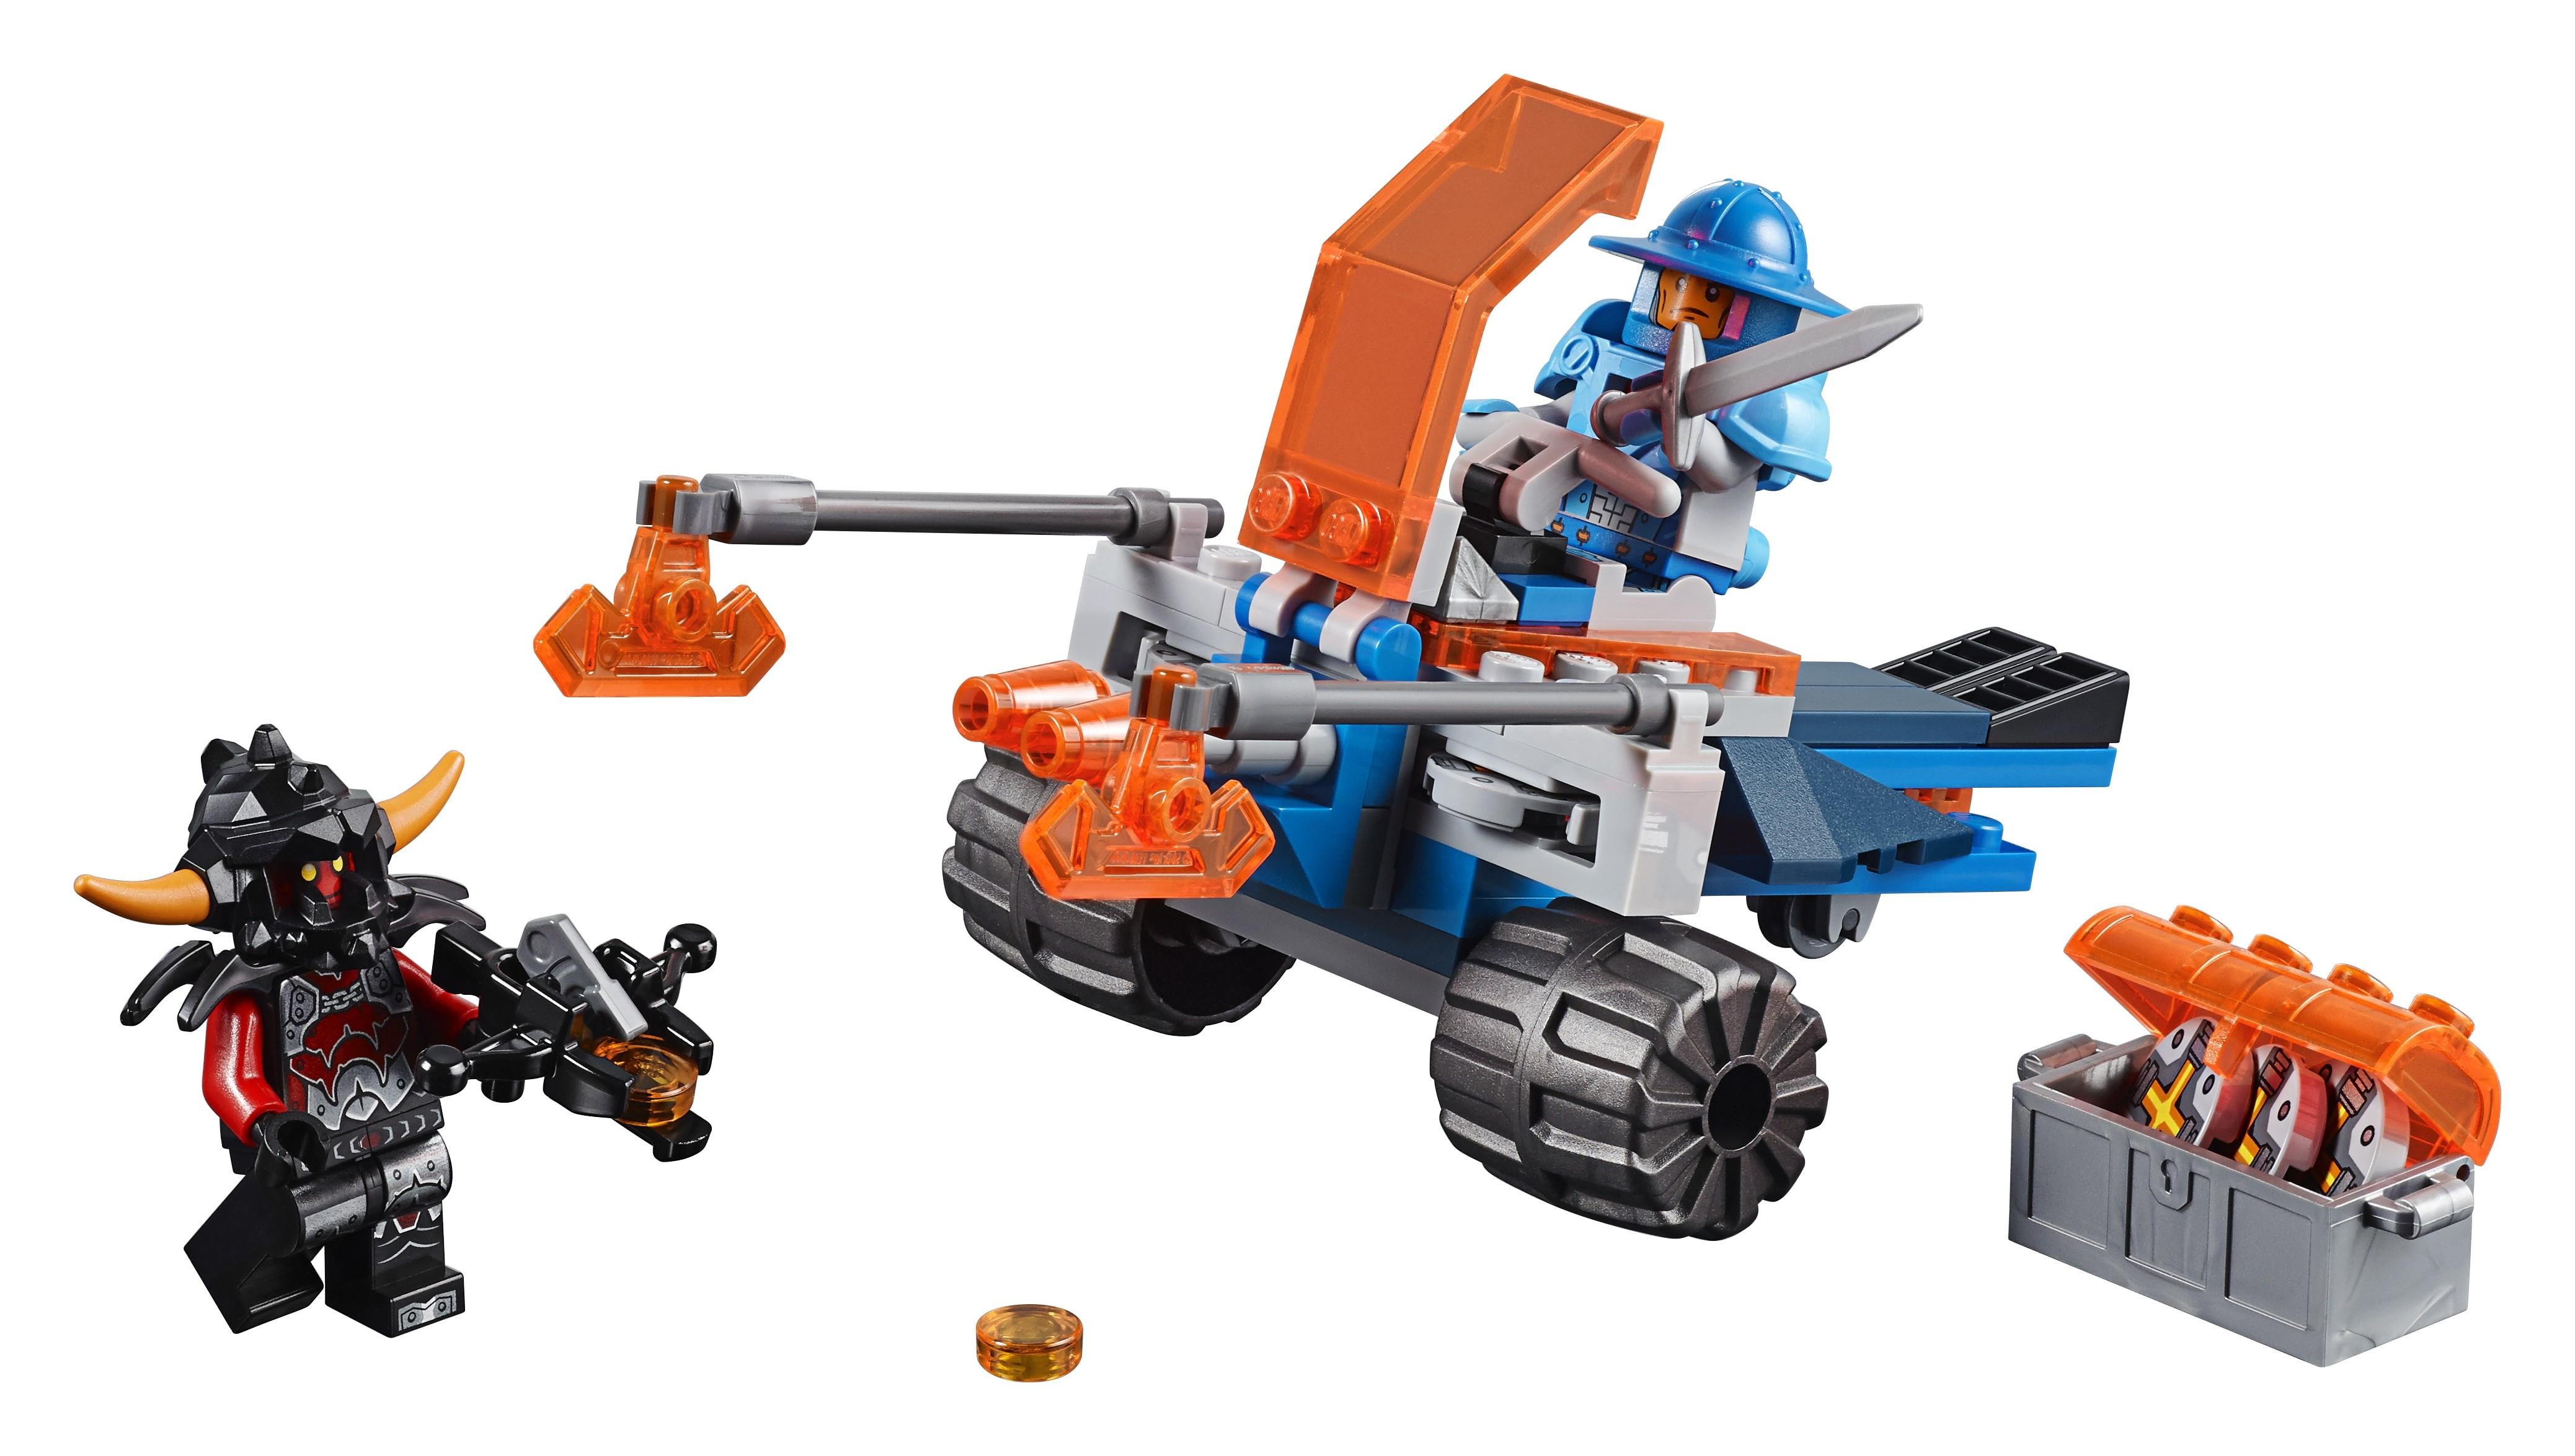 Бластеры LEGO Nexo Knights 70310 Королевский боевой бластер lepin nexo knights axl glob lobber combination marvel building blocks kits toys compatible legoe nexus